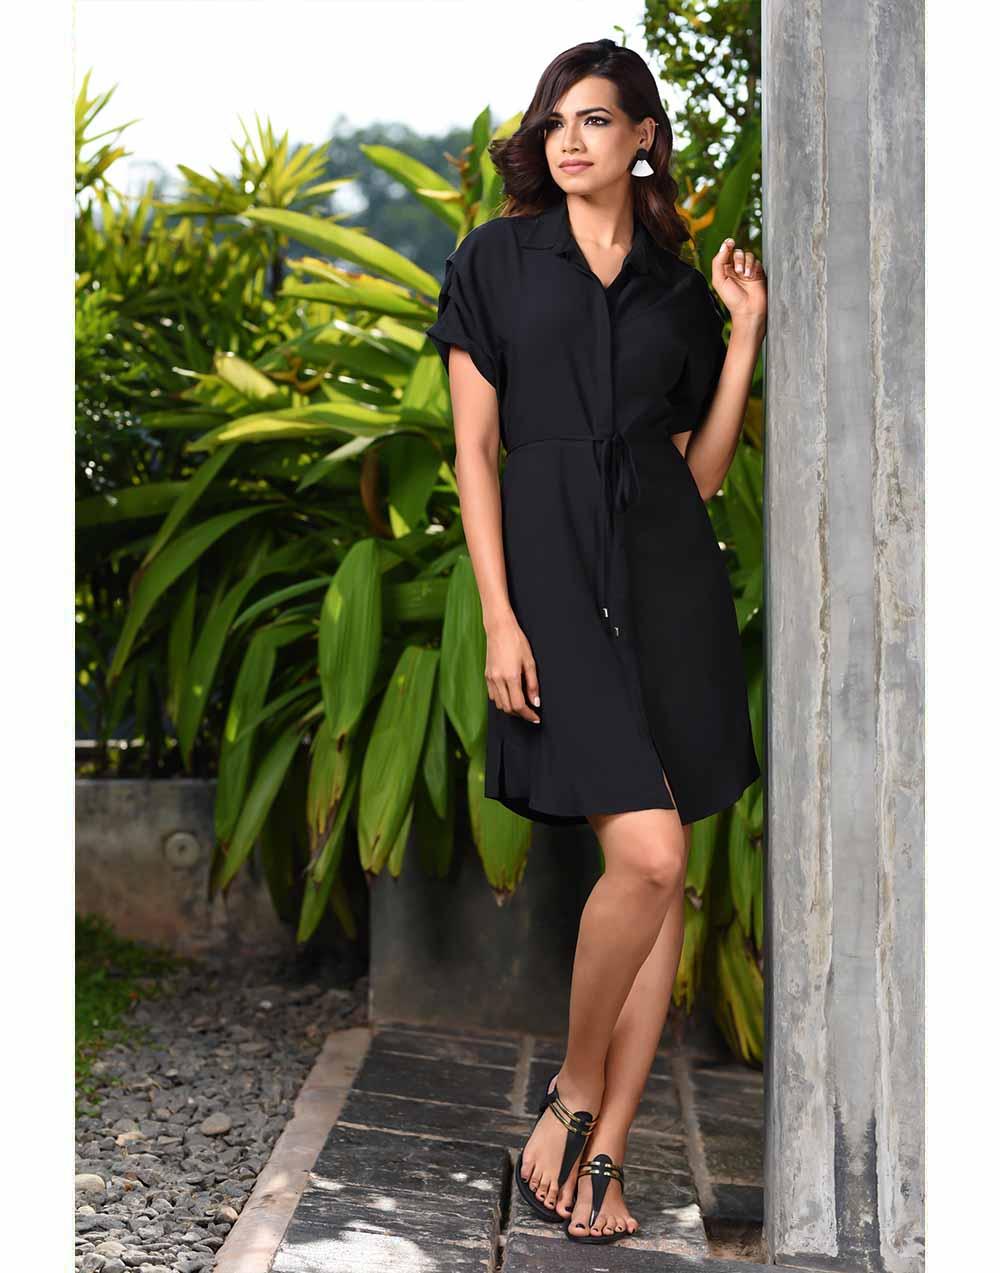 5467ef19369 Black Tie Dresses Online Uk - Gomes Weine AG